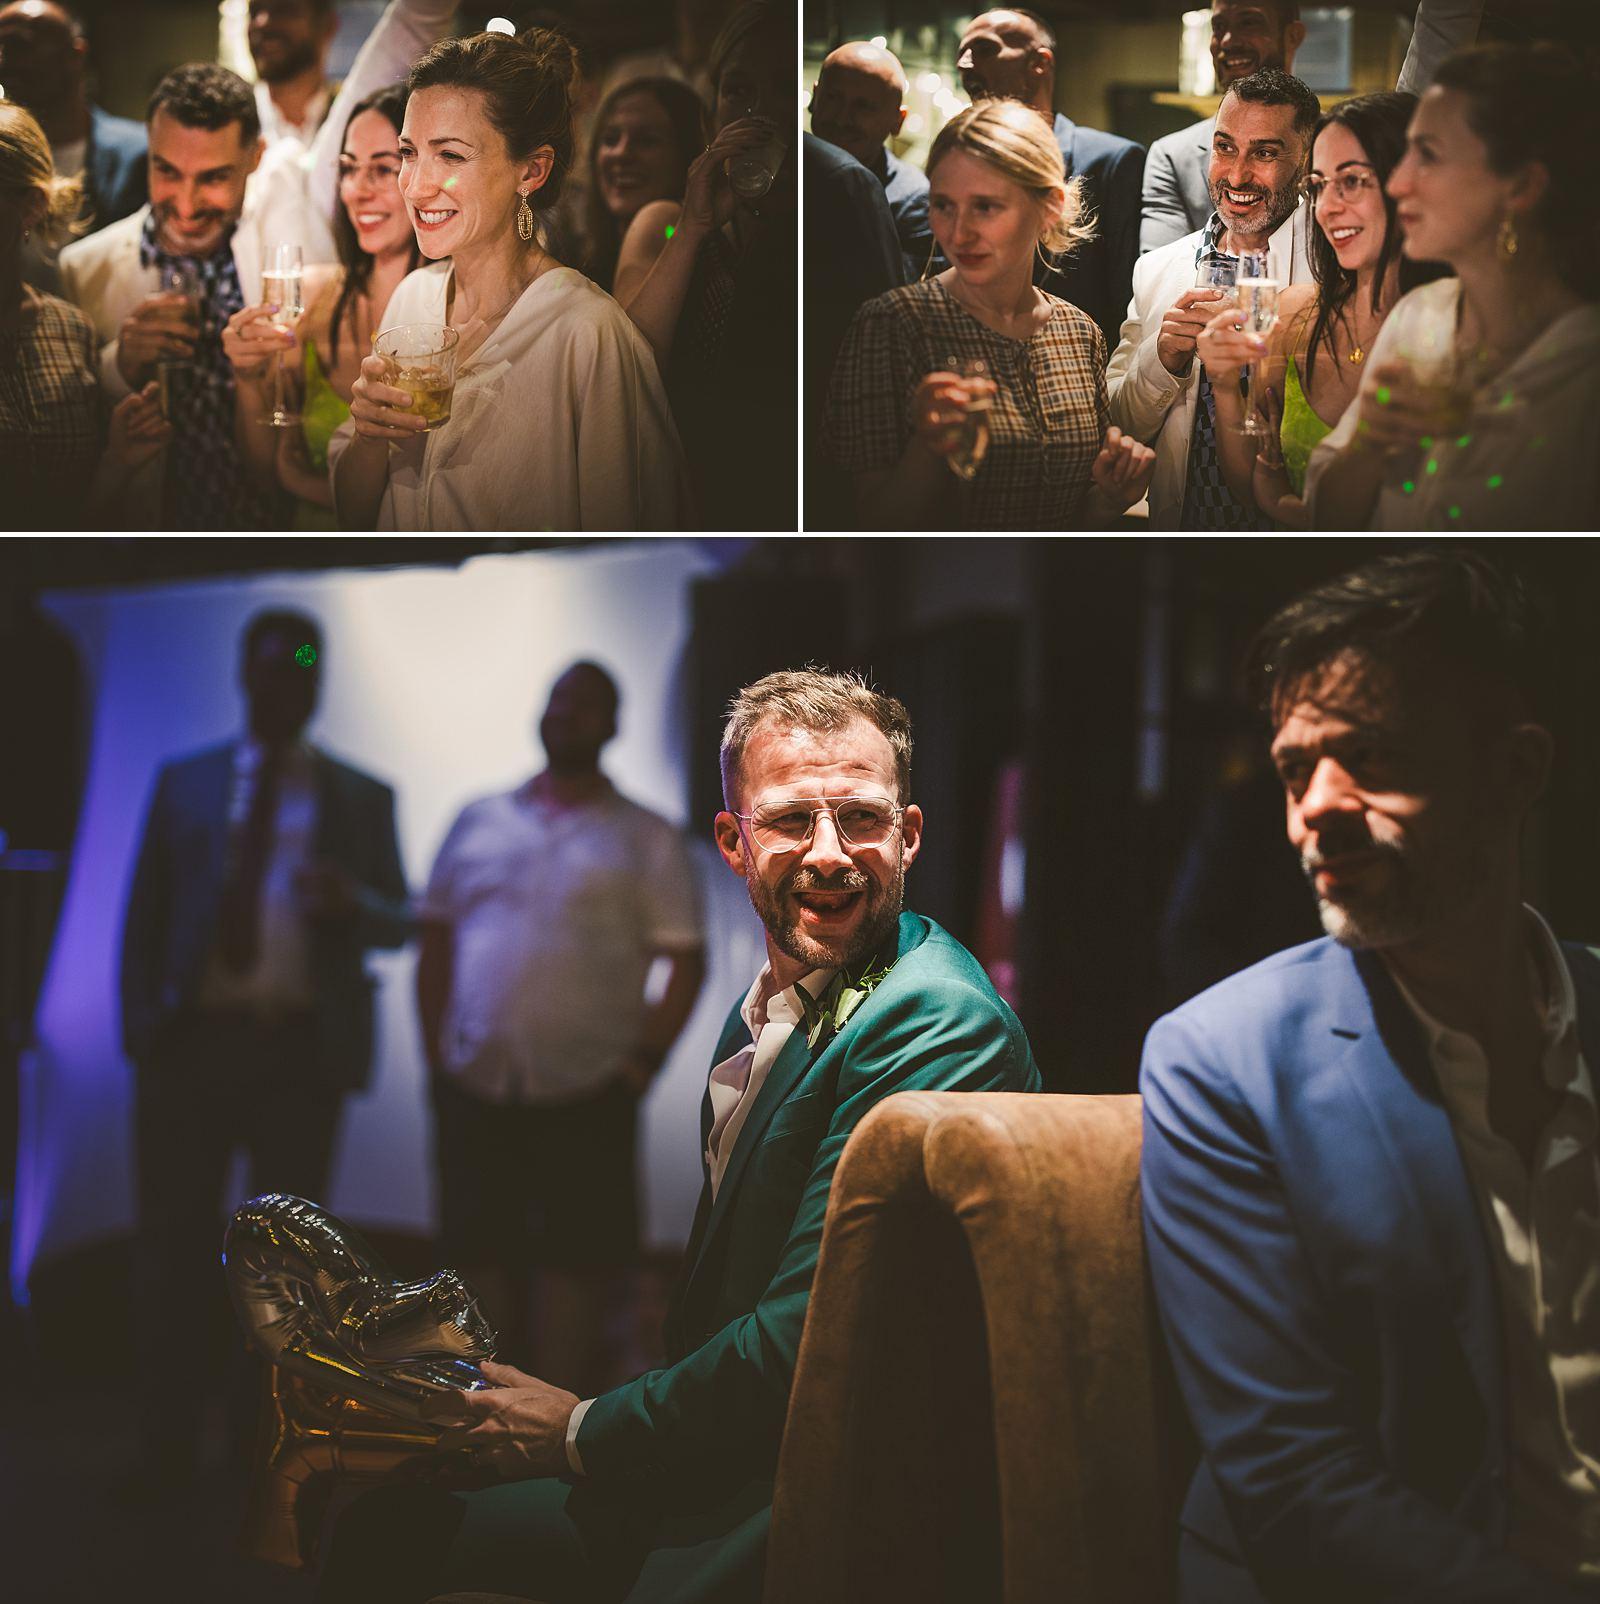 Reportage wedding photography London